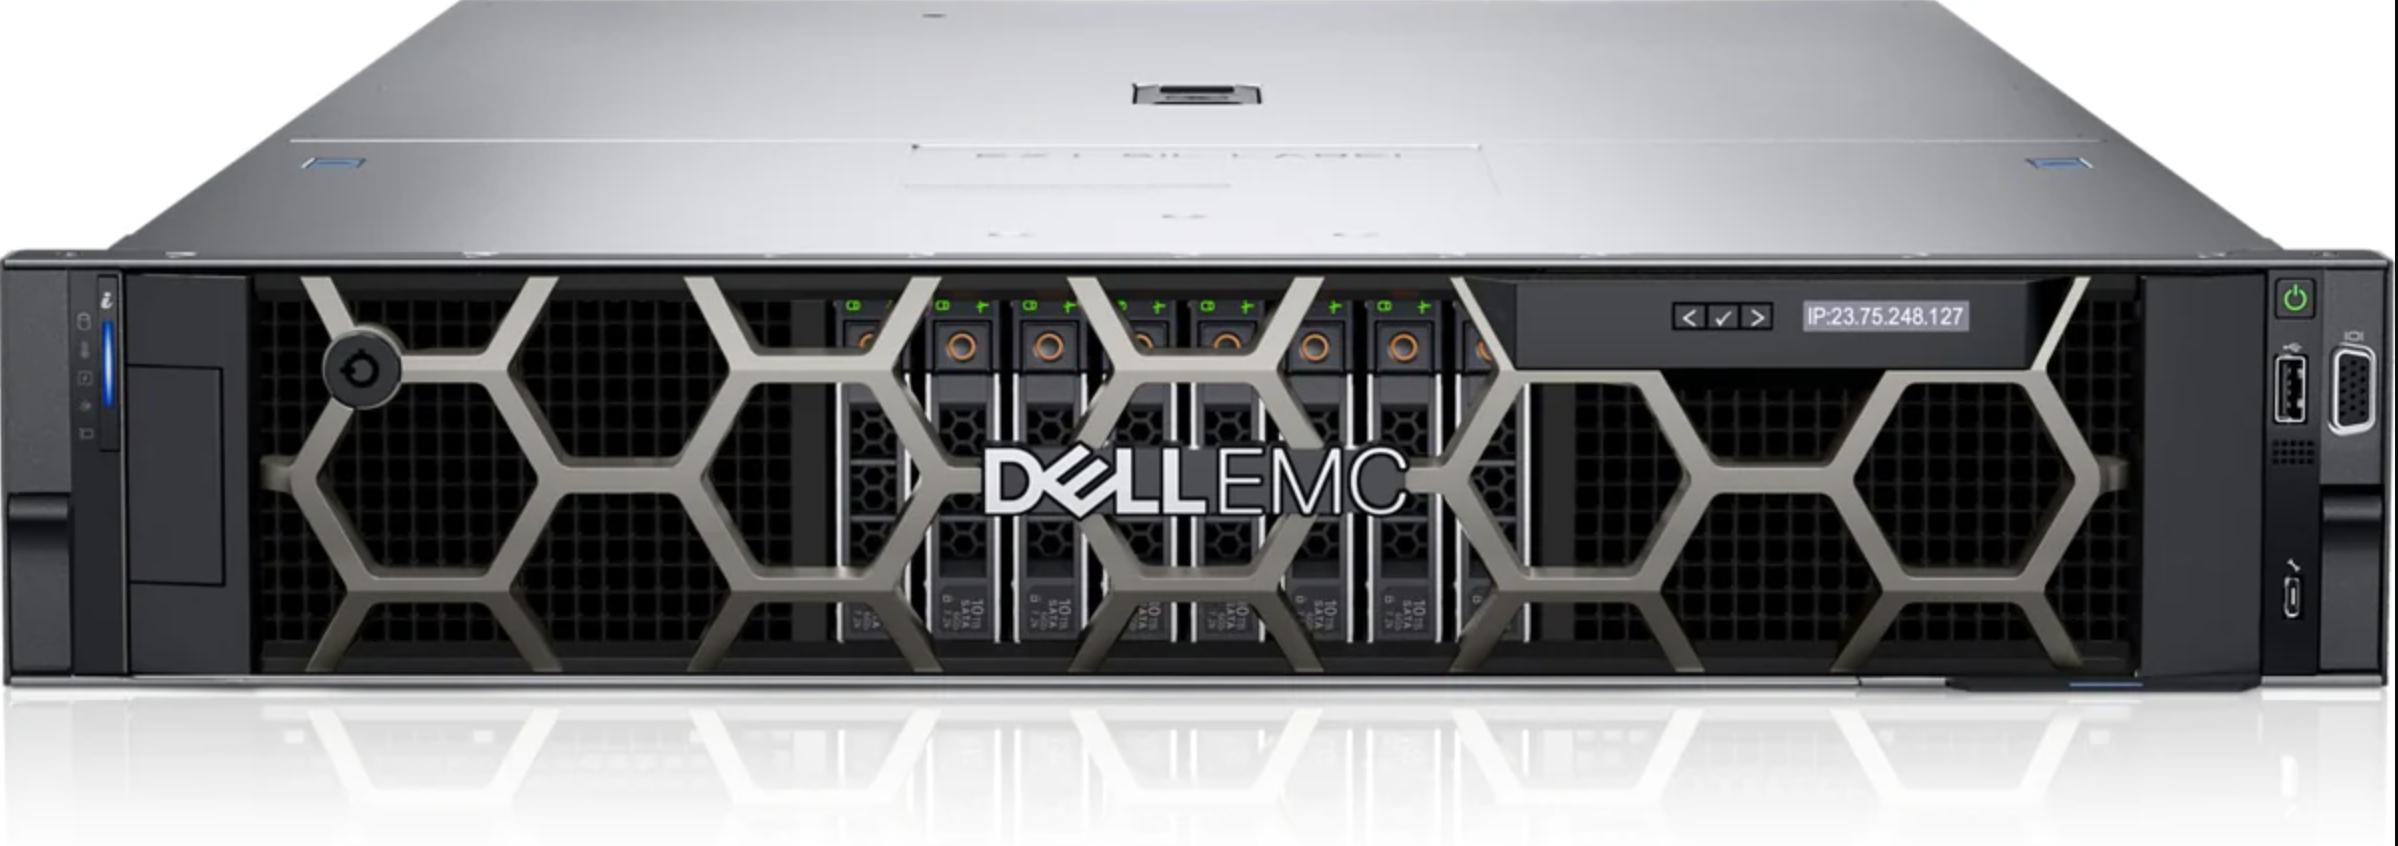 Dell EMC PowerEdge R750xa